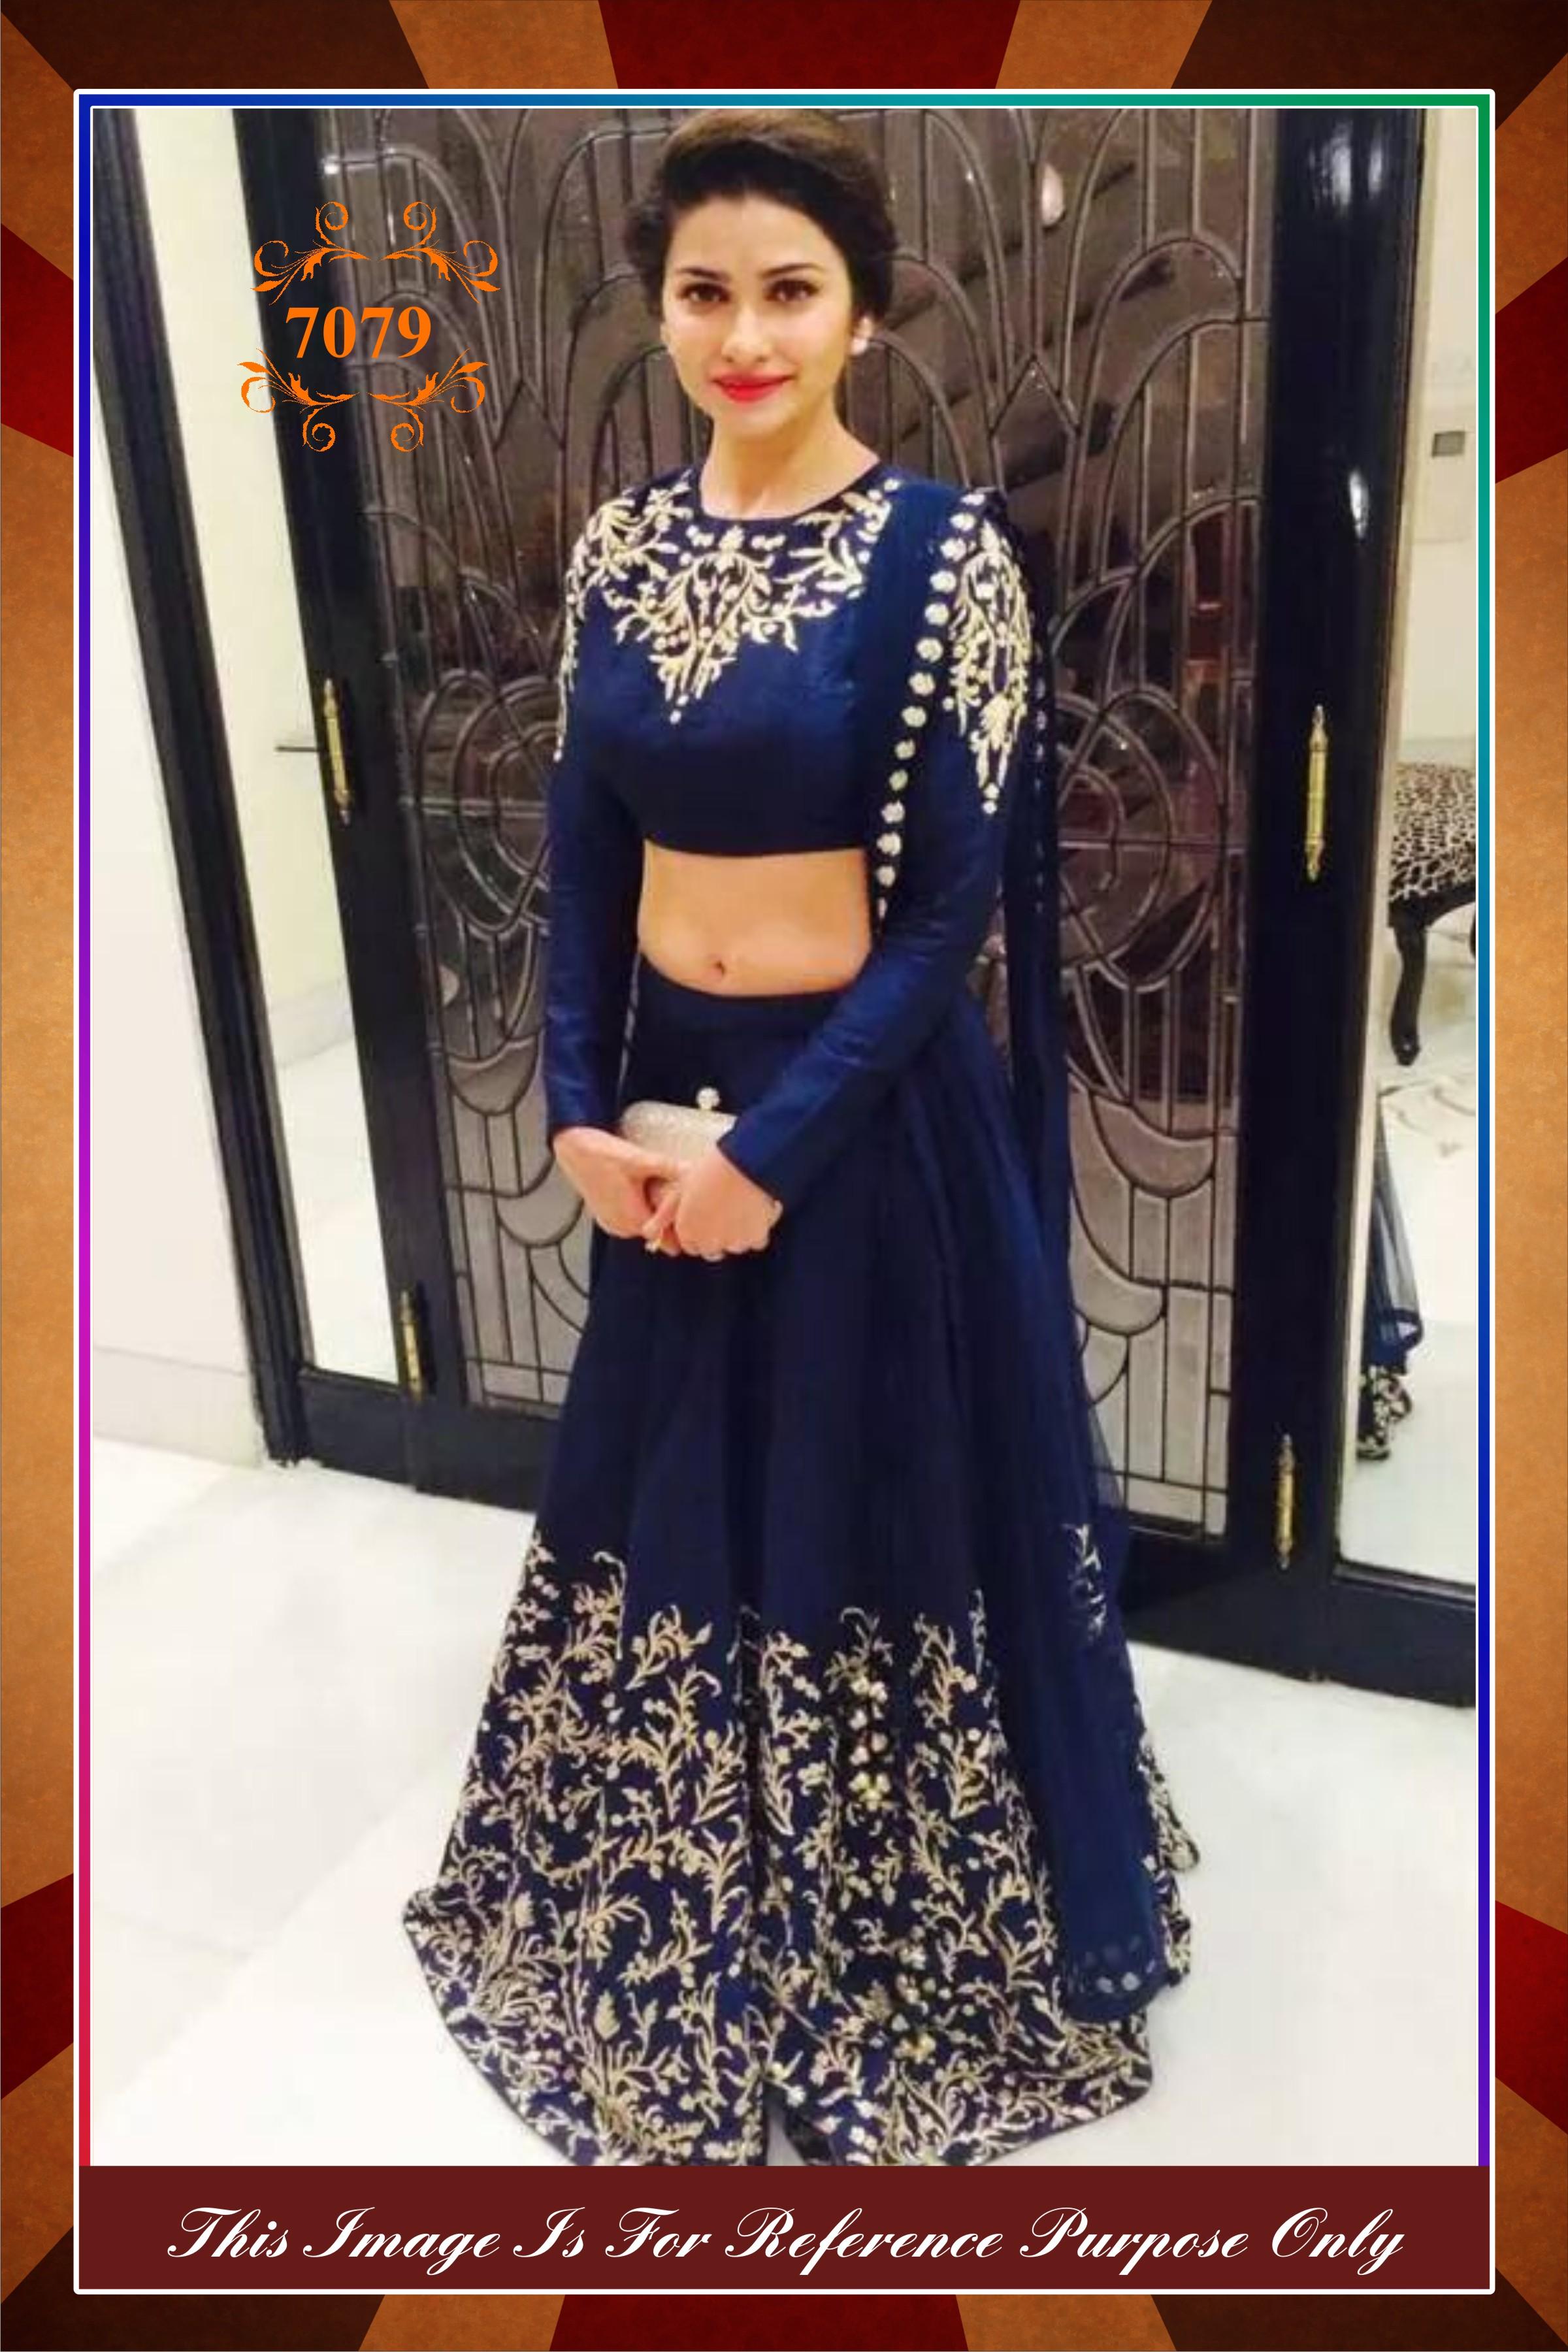 f1c5102dae Heavy Partywear Stylist Wedding Designer Blue Lehenga Replica - AURA  D'ZIGNS - 380547